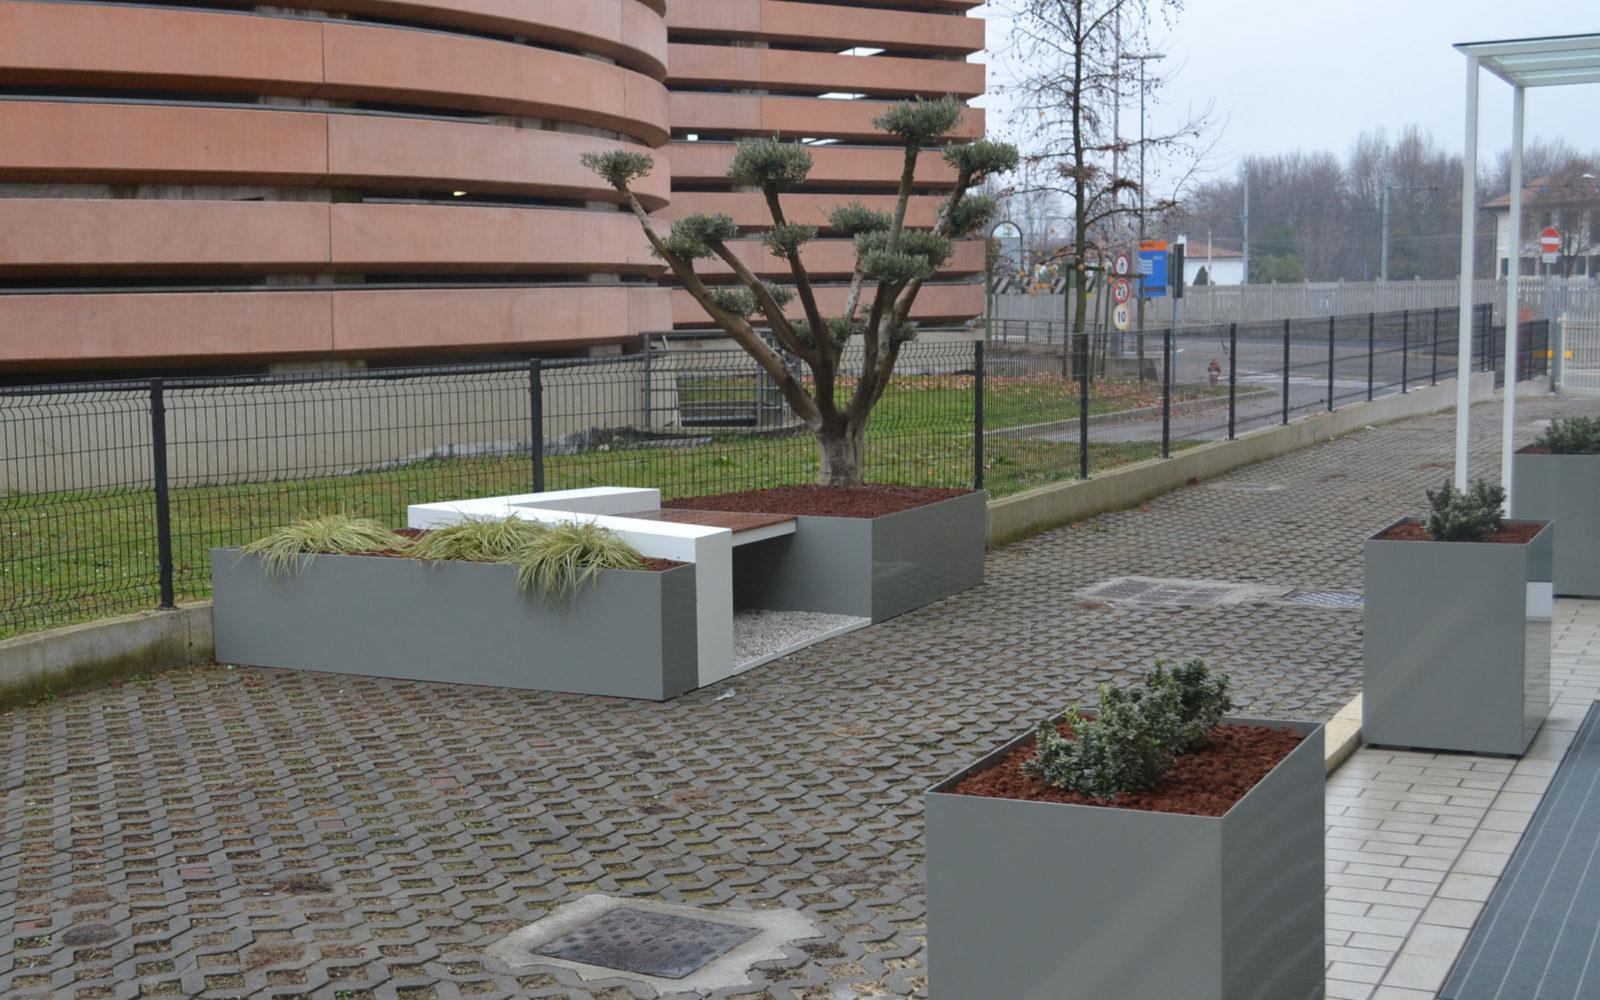 giardino fuori porta a Treviso - 4